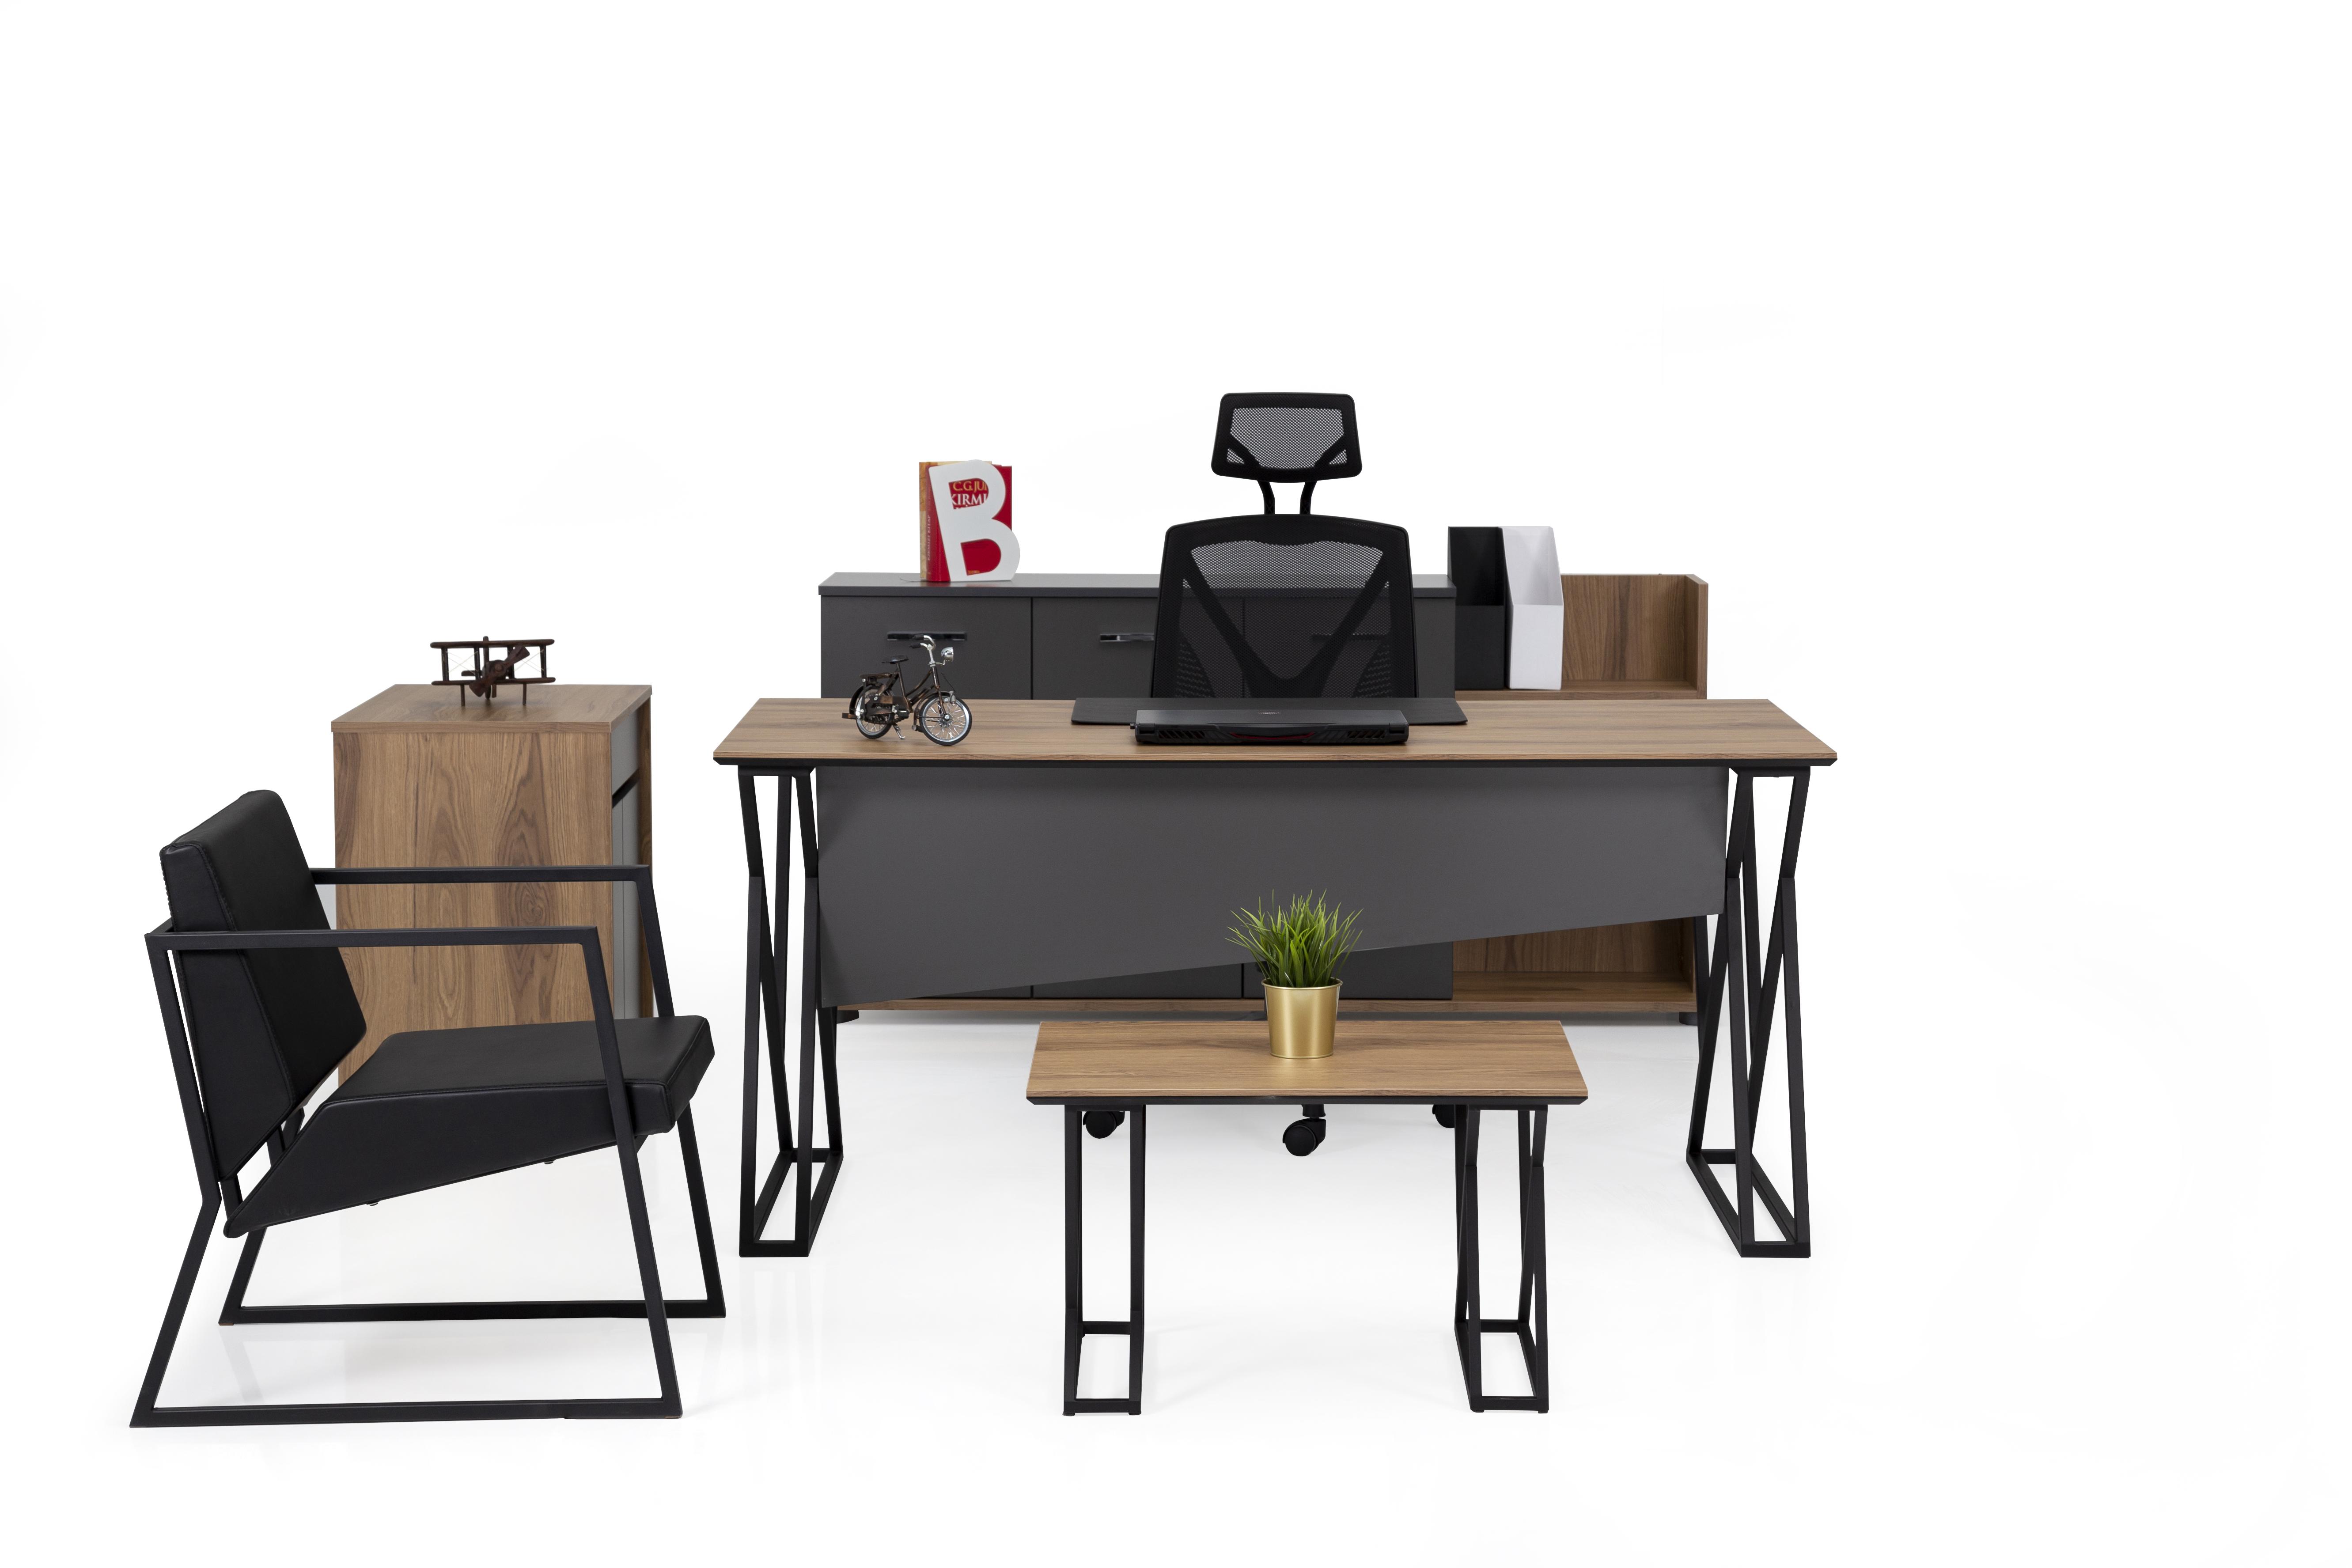 Ovali Büromöbel komplett 4-teilig Buton 140x80 cm